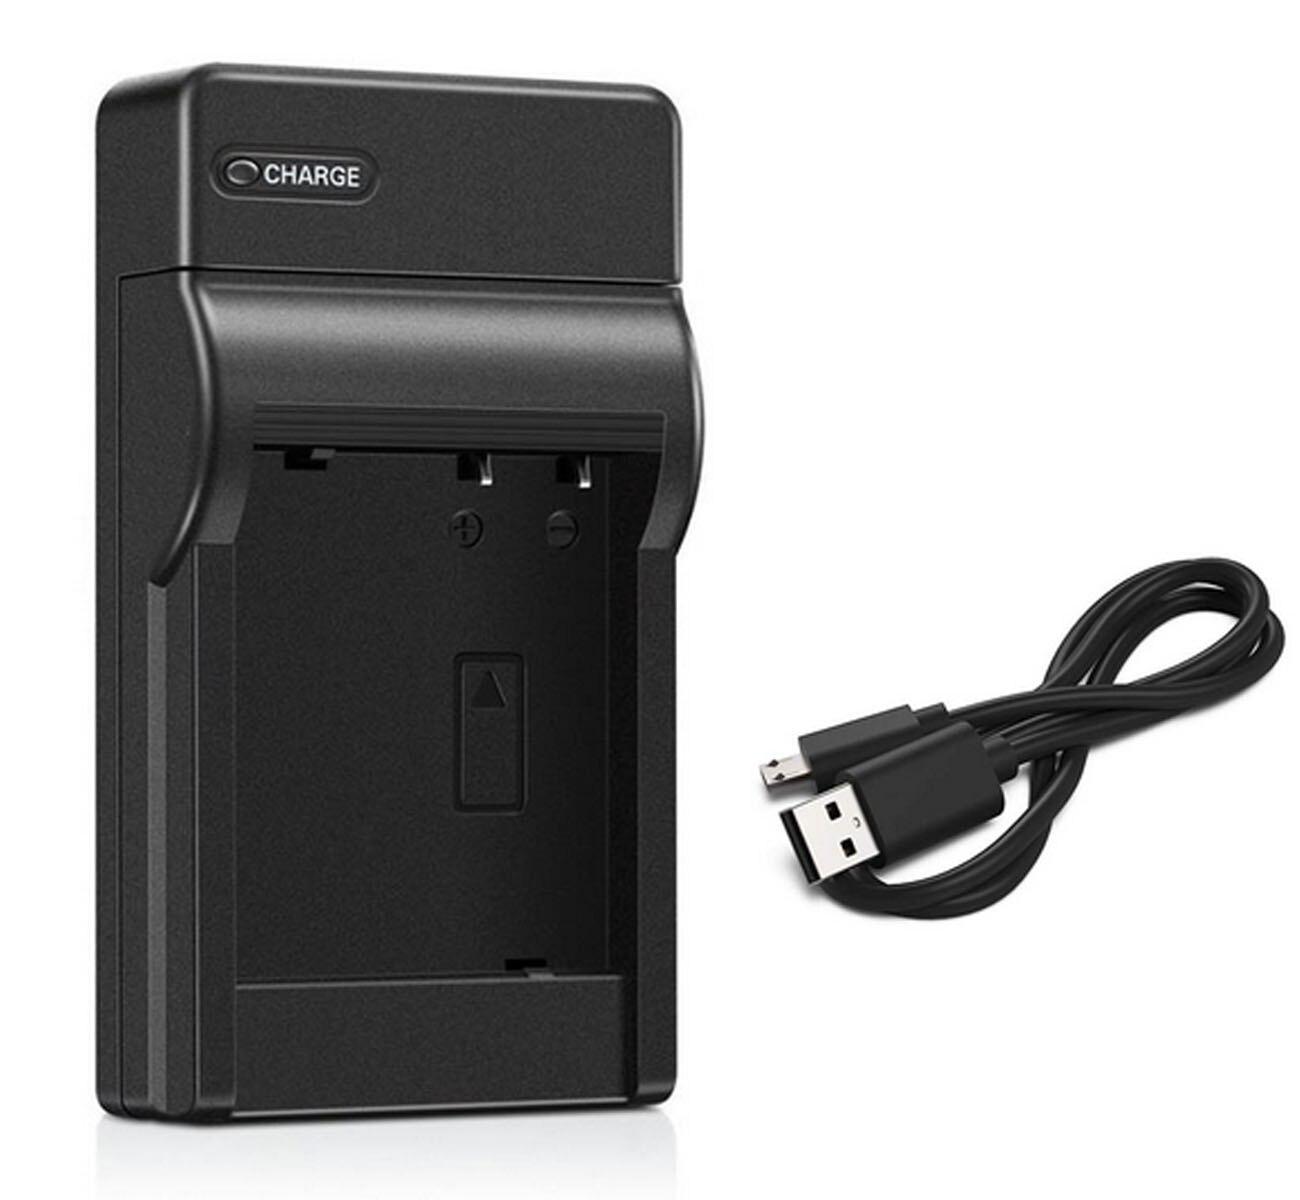 Micro-USB Cargador Para JVC VL108 DVL109 DVL150